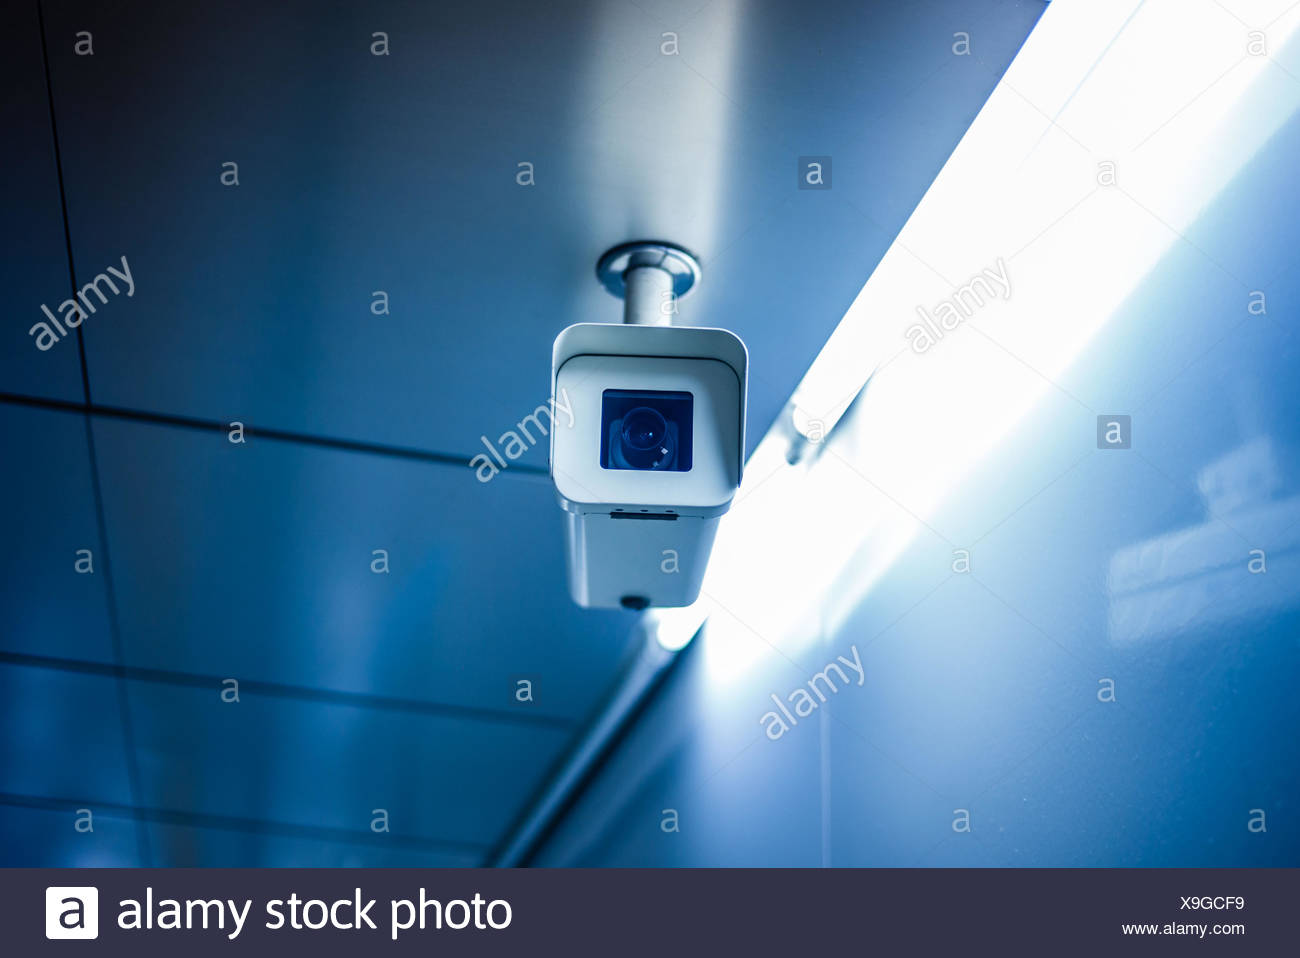 Surveillance camera. - Stock Image